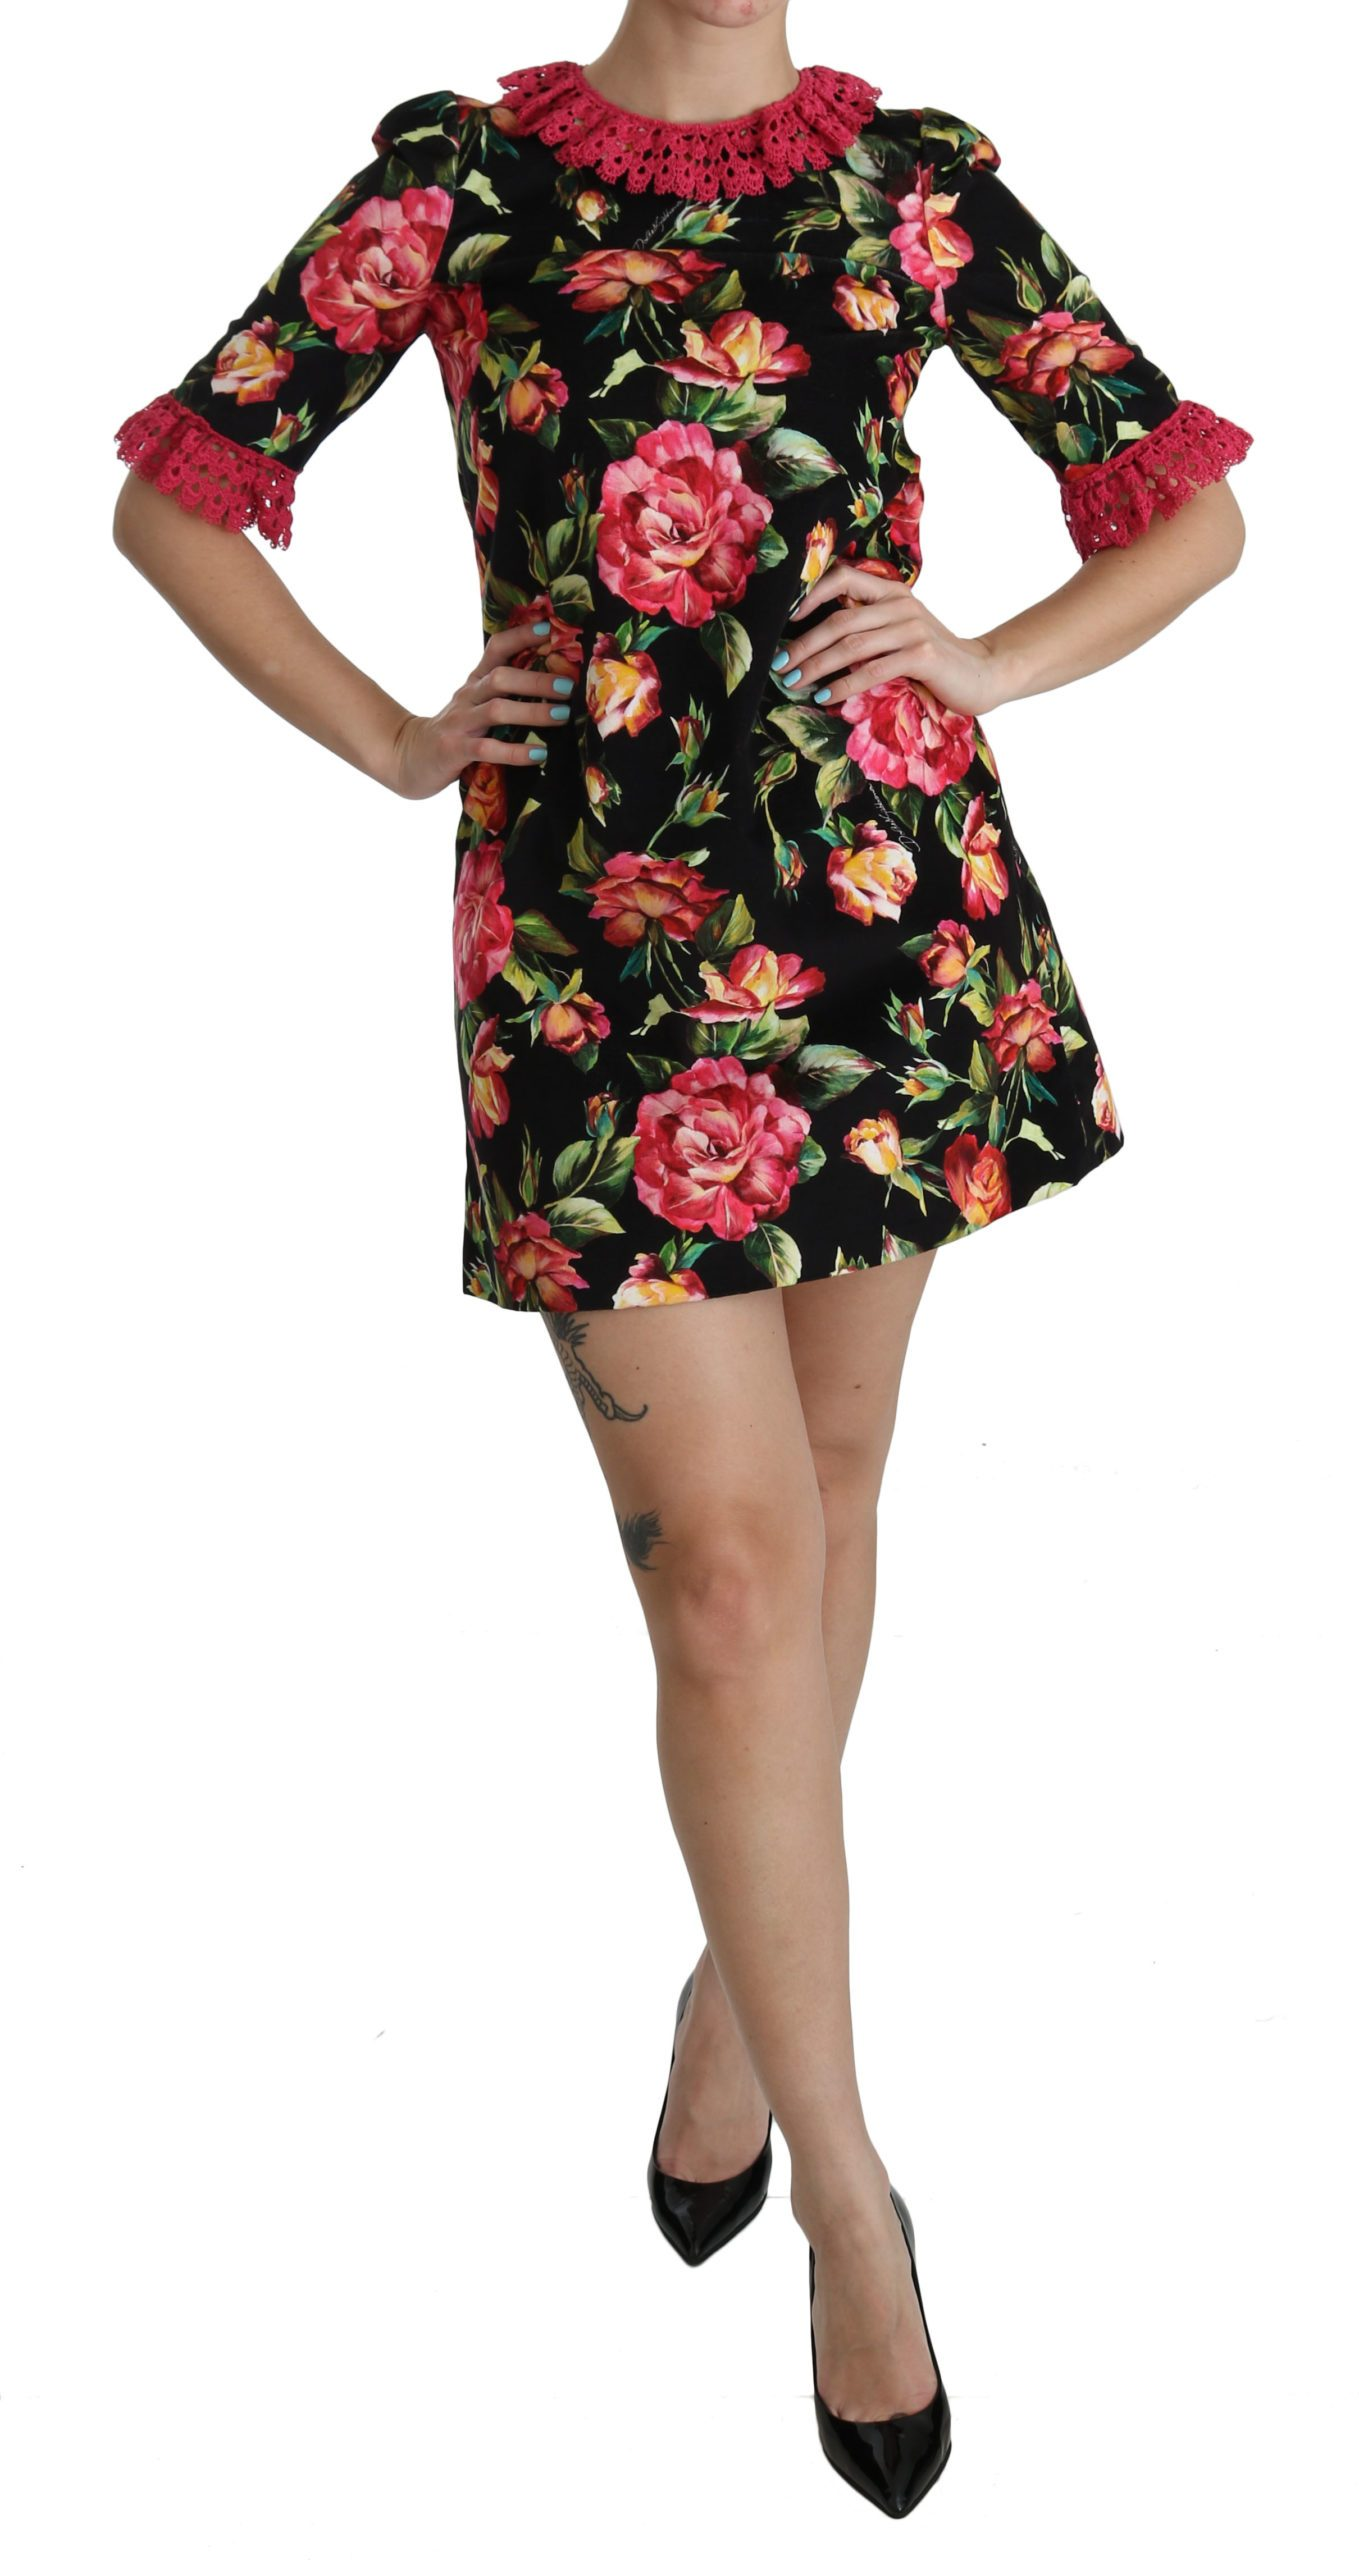 Dolce & Gabbana Women's Lace A-Line Shift Mini Dress Black DR2085 - IT38|XS